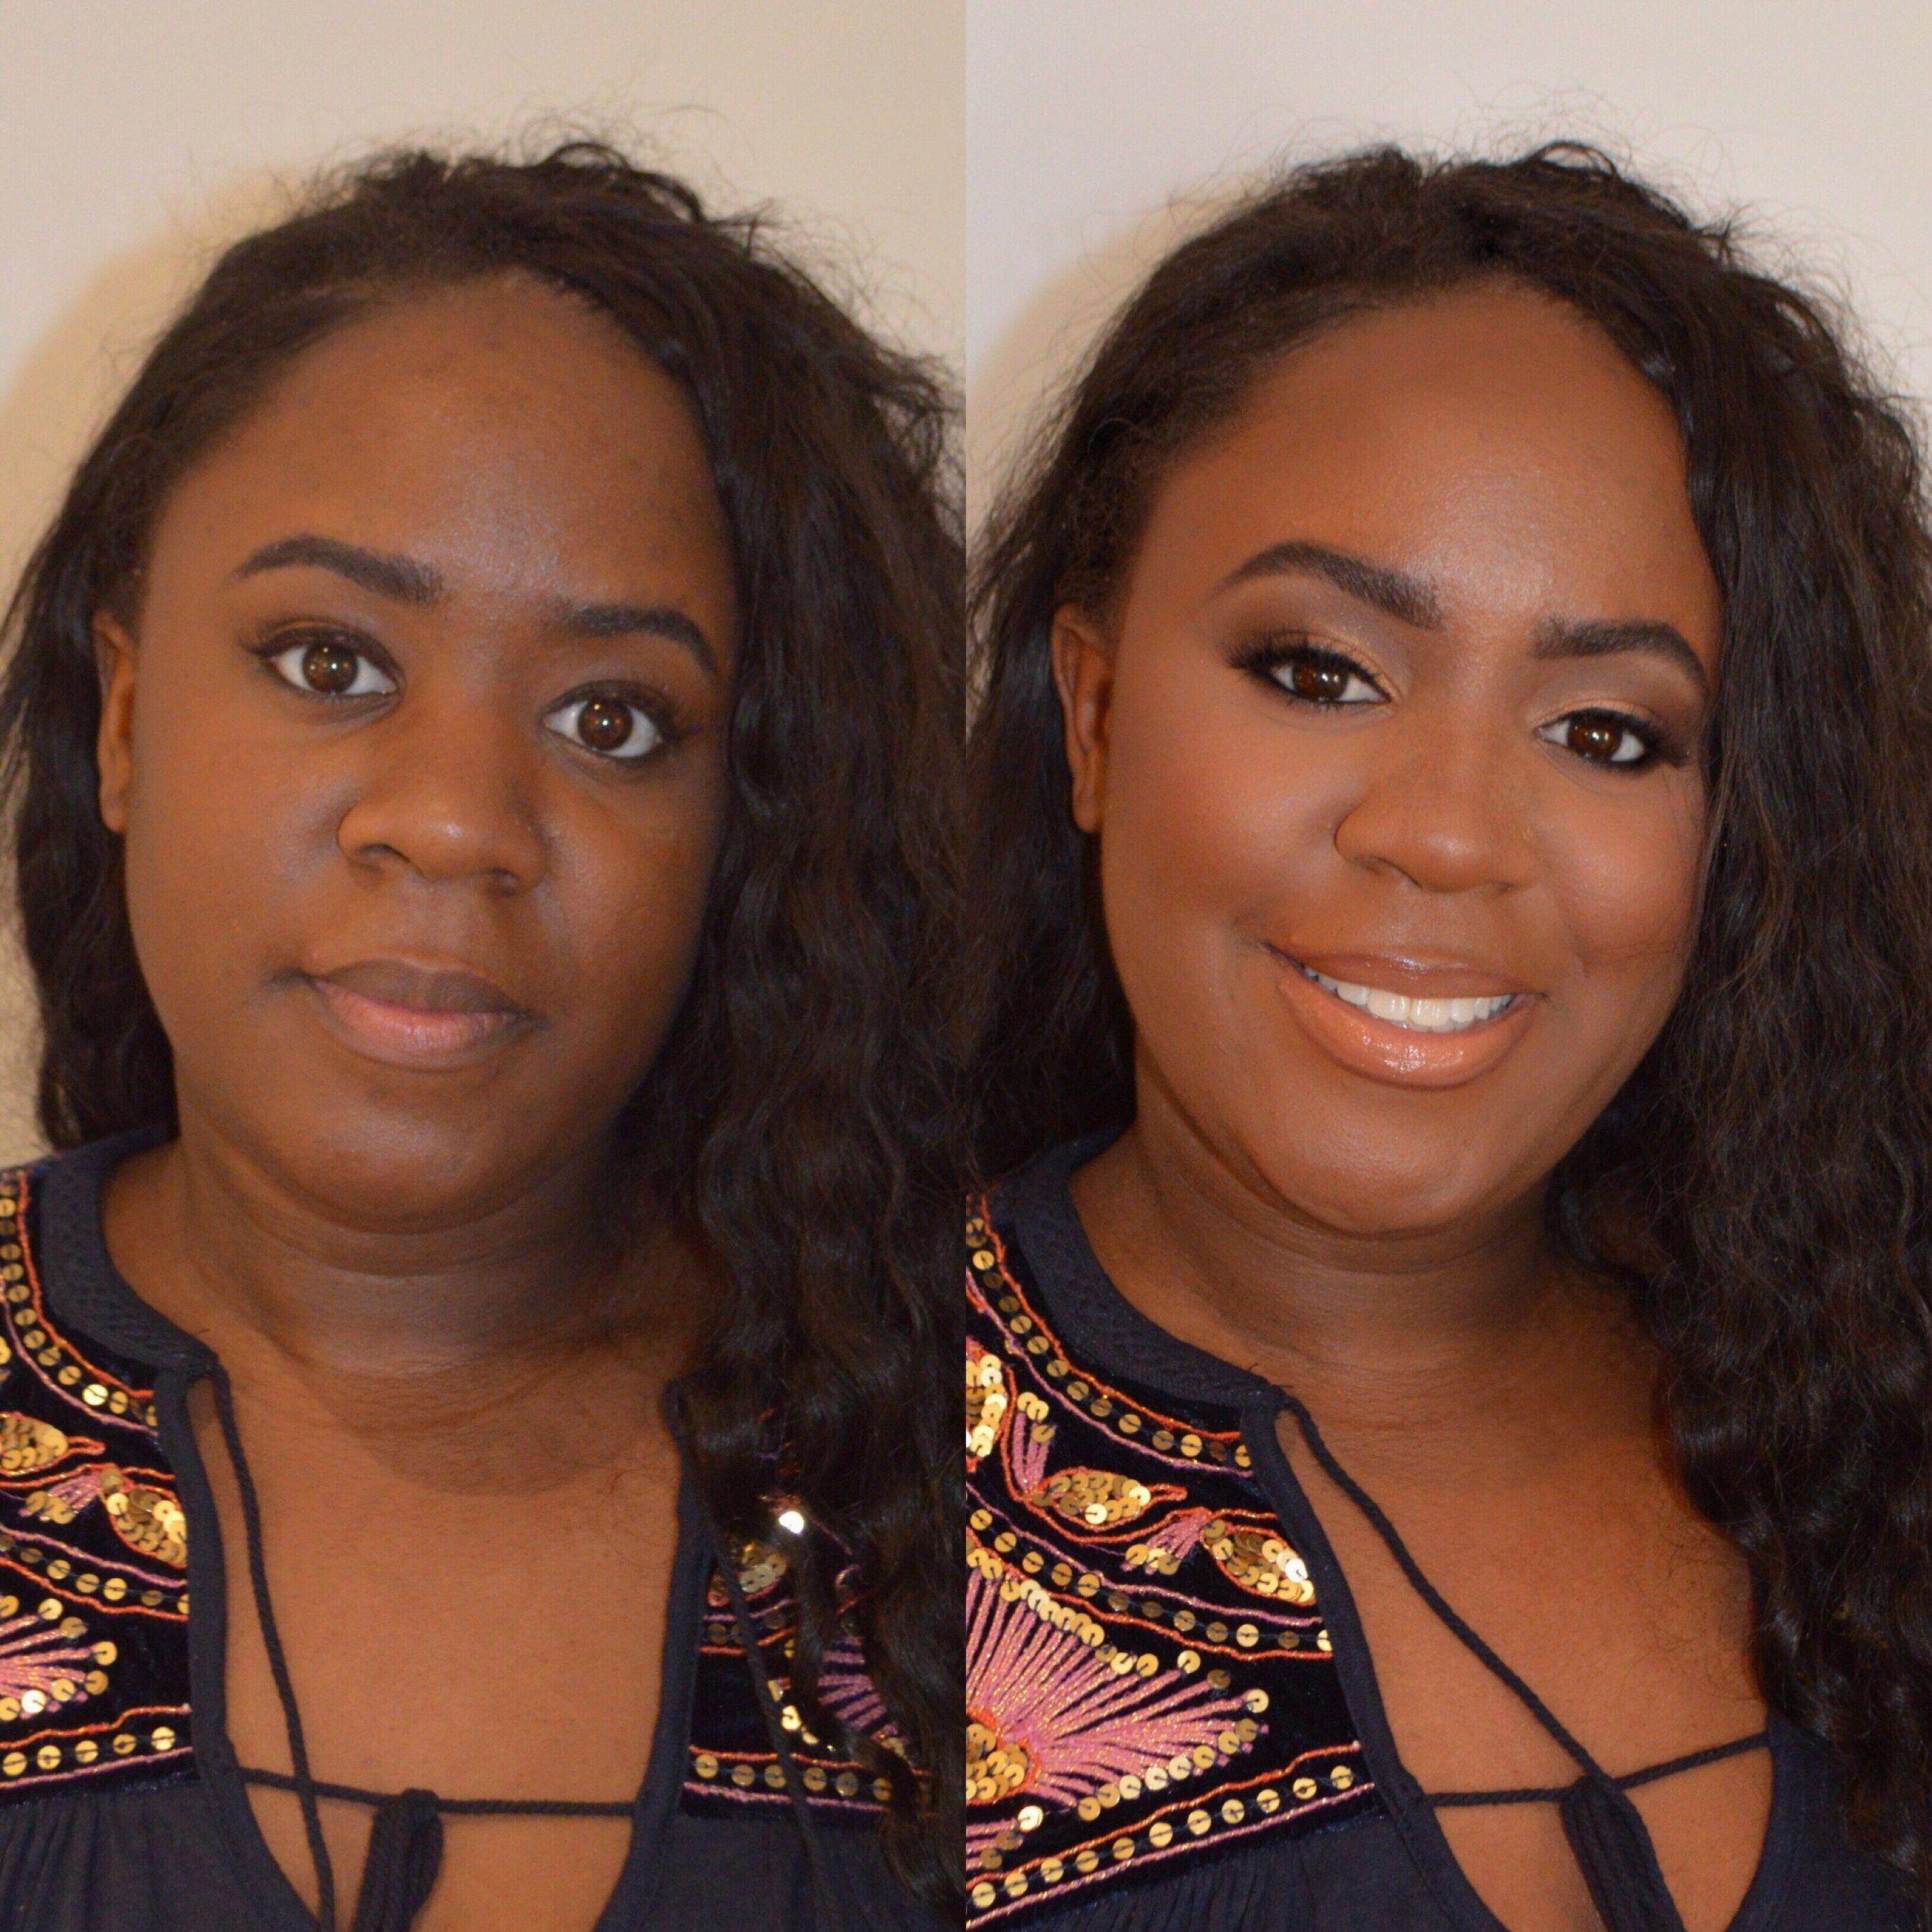 Patricia_Castro_Makeup_Los_Angeles_Makeup_Artist_45.JPG